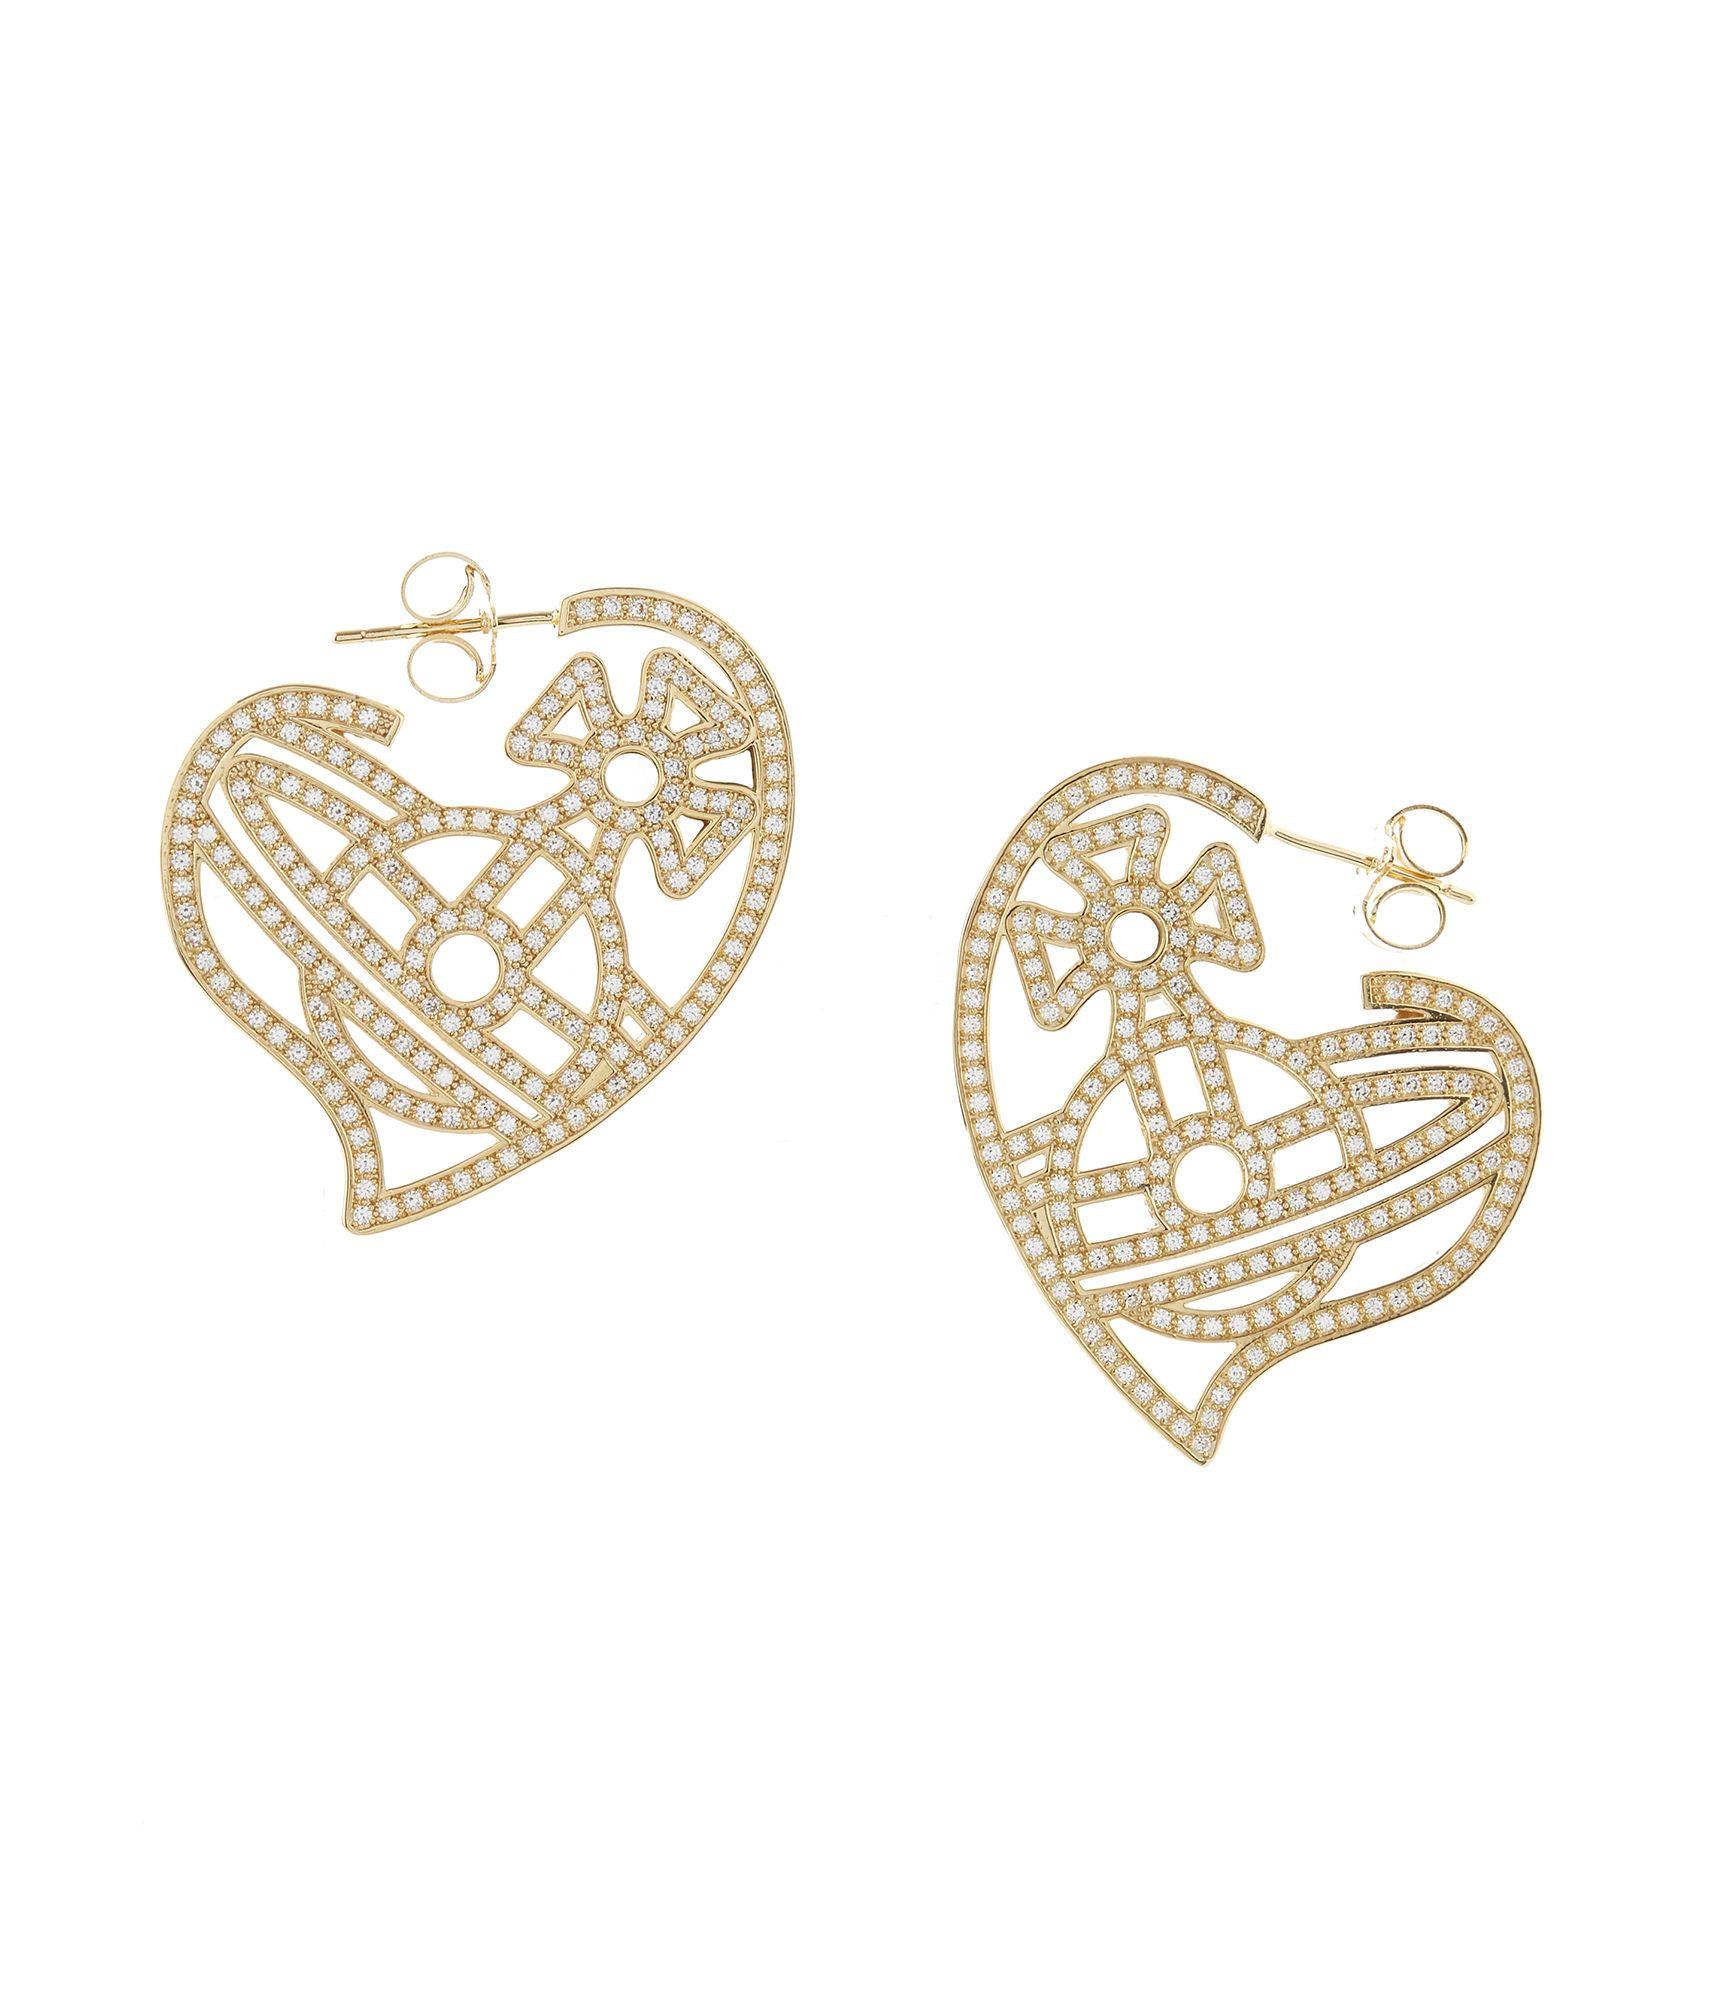 17e70e883 Giuseppa Hoop Earrings Gold Tone | AW1819 ACCESSORIES | VIVIENNE ...